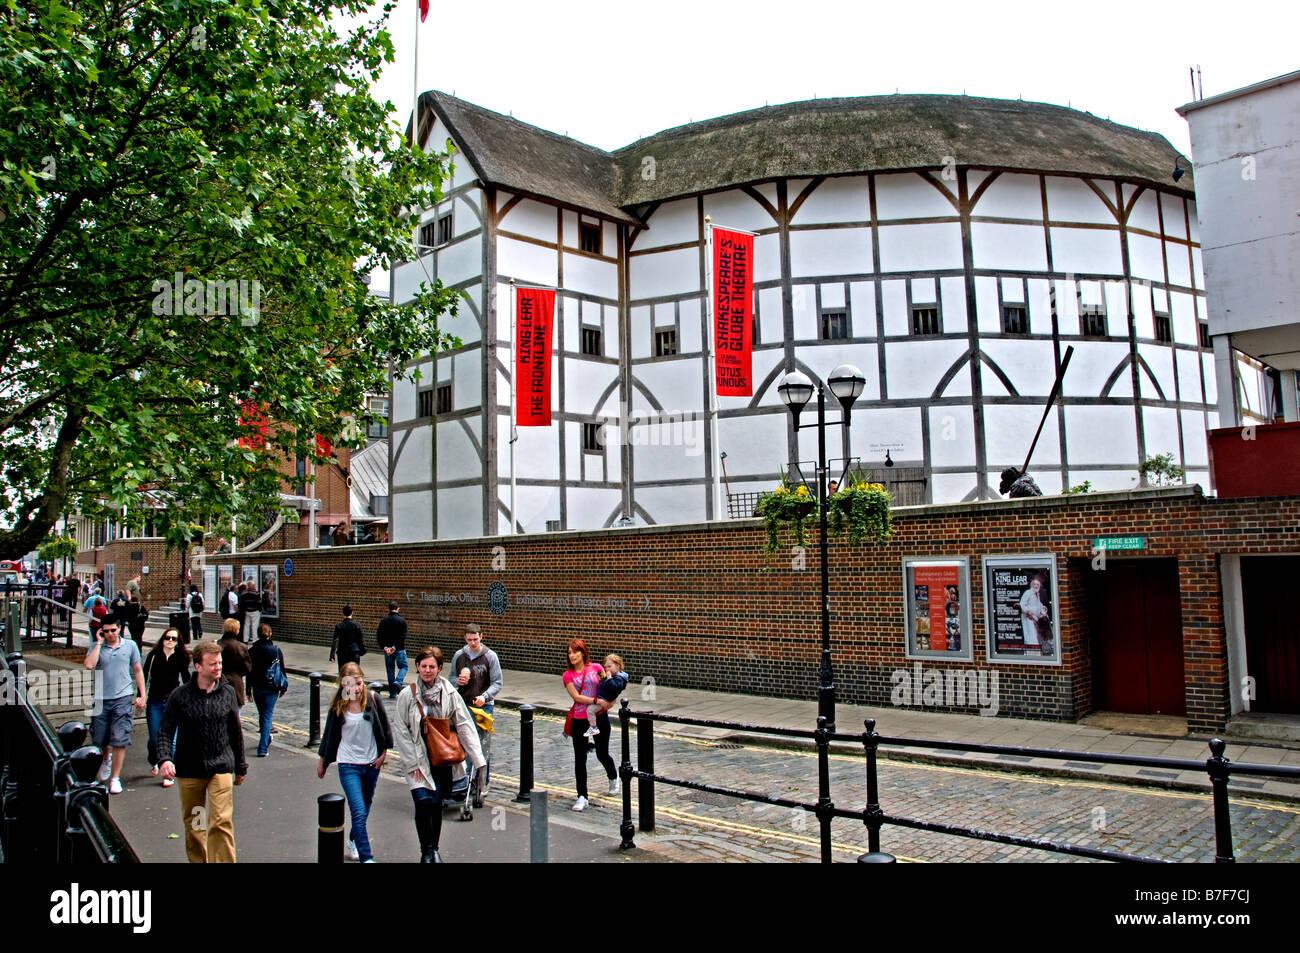 The Sheakspeare Globe Theatre London Tudor theatre performance stage South Bank - Stock Image